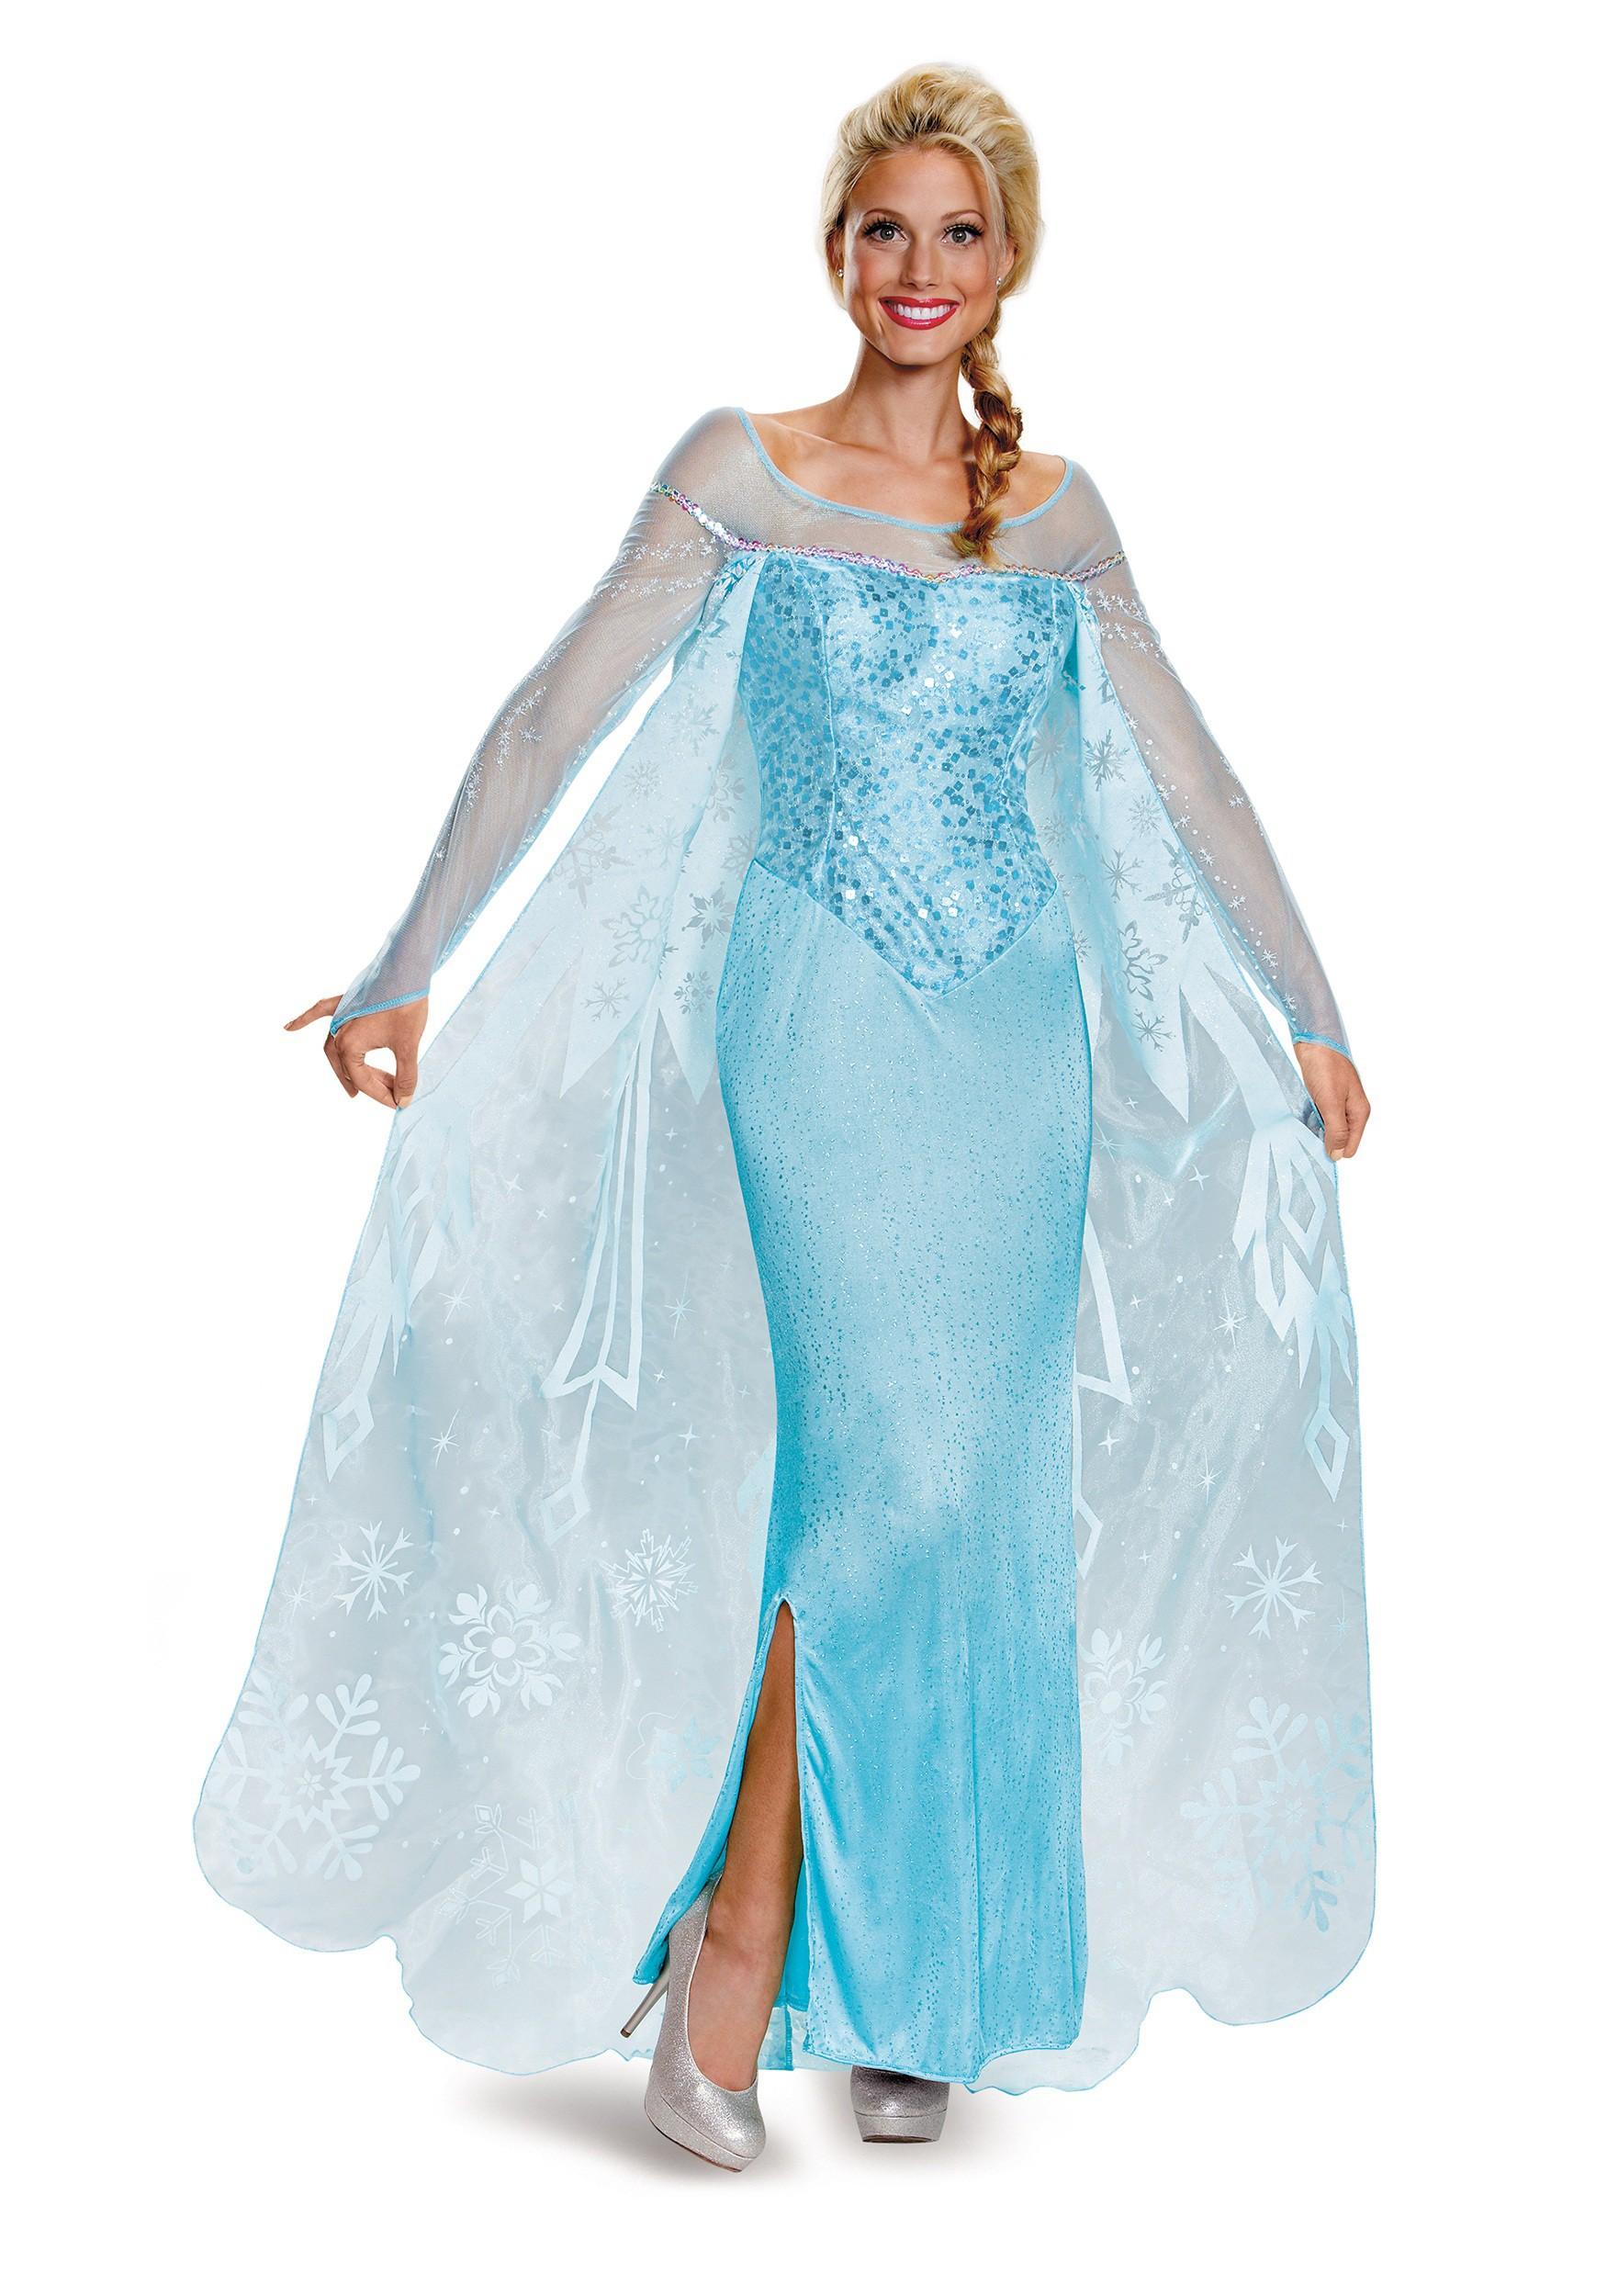 Frozen Adult Elsa Prestige Costume   Elsa Cosplay Costume